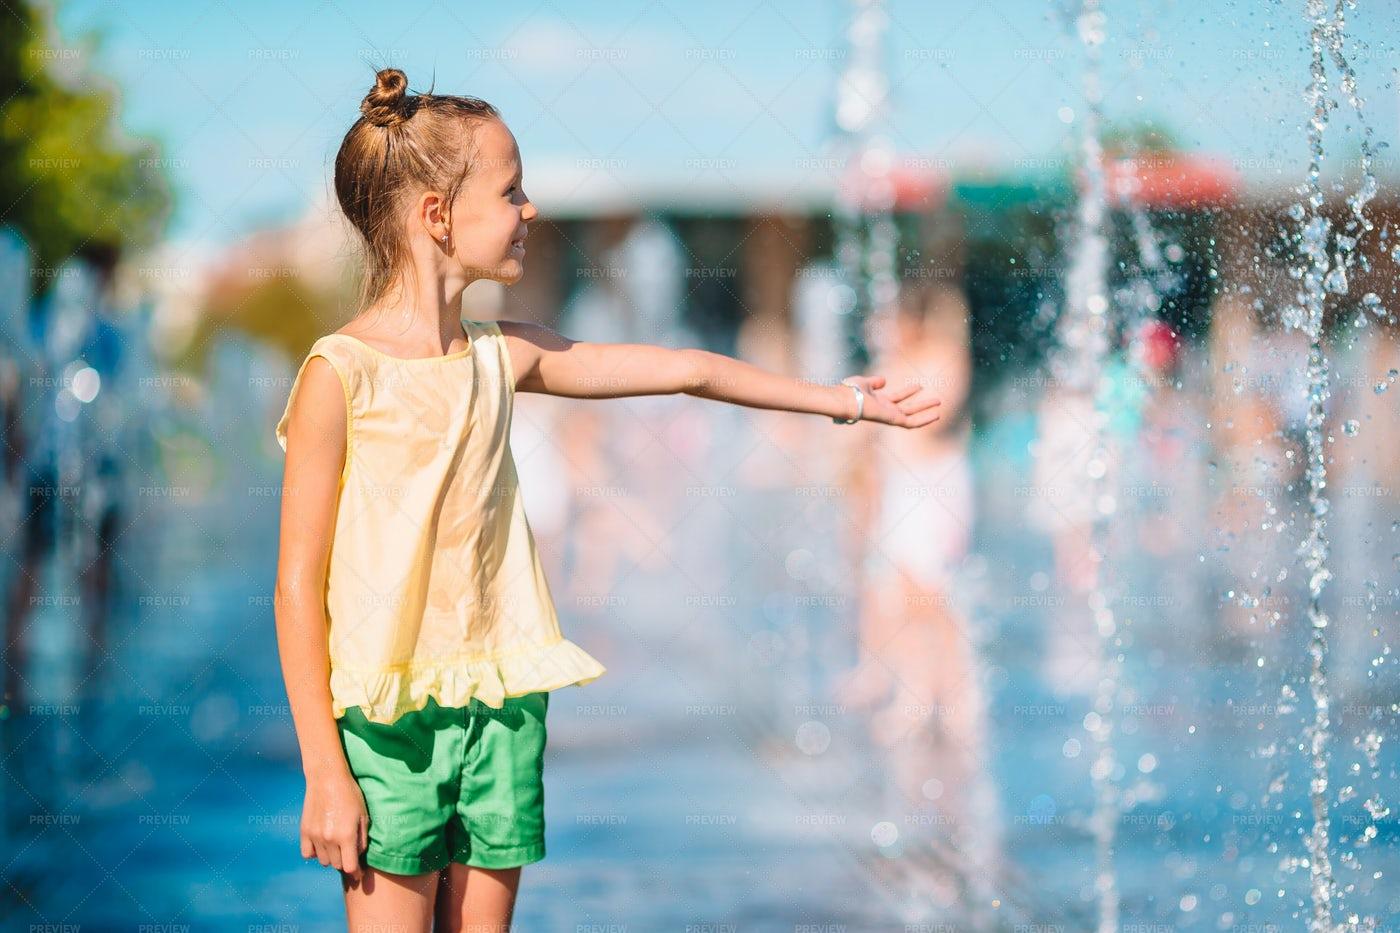 Child At A Splash Pad Fountain: Stock Photos